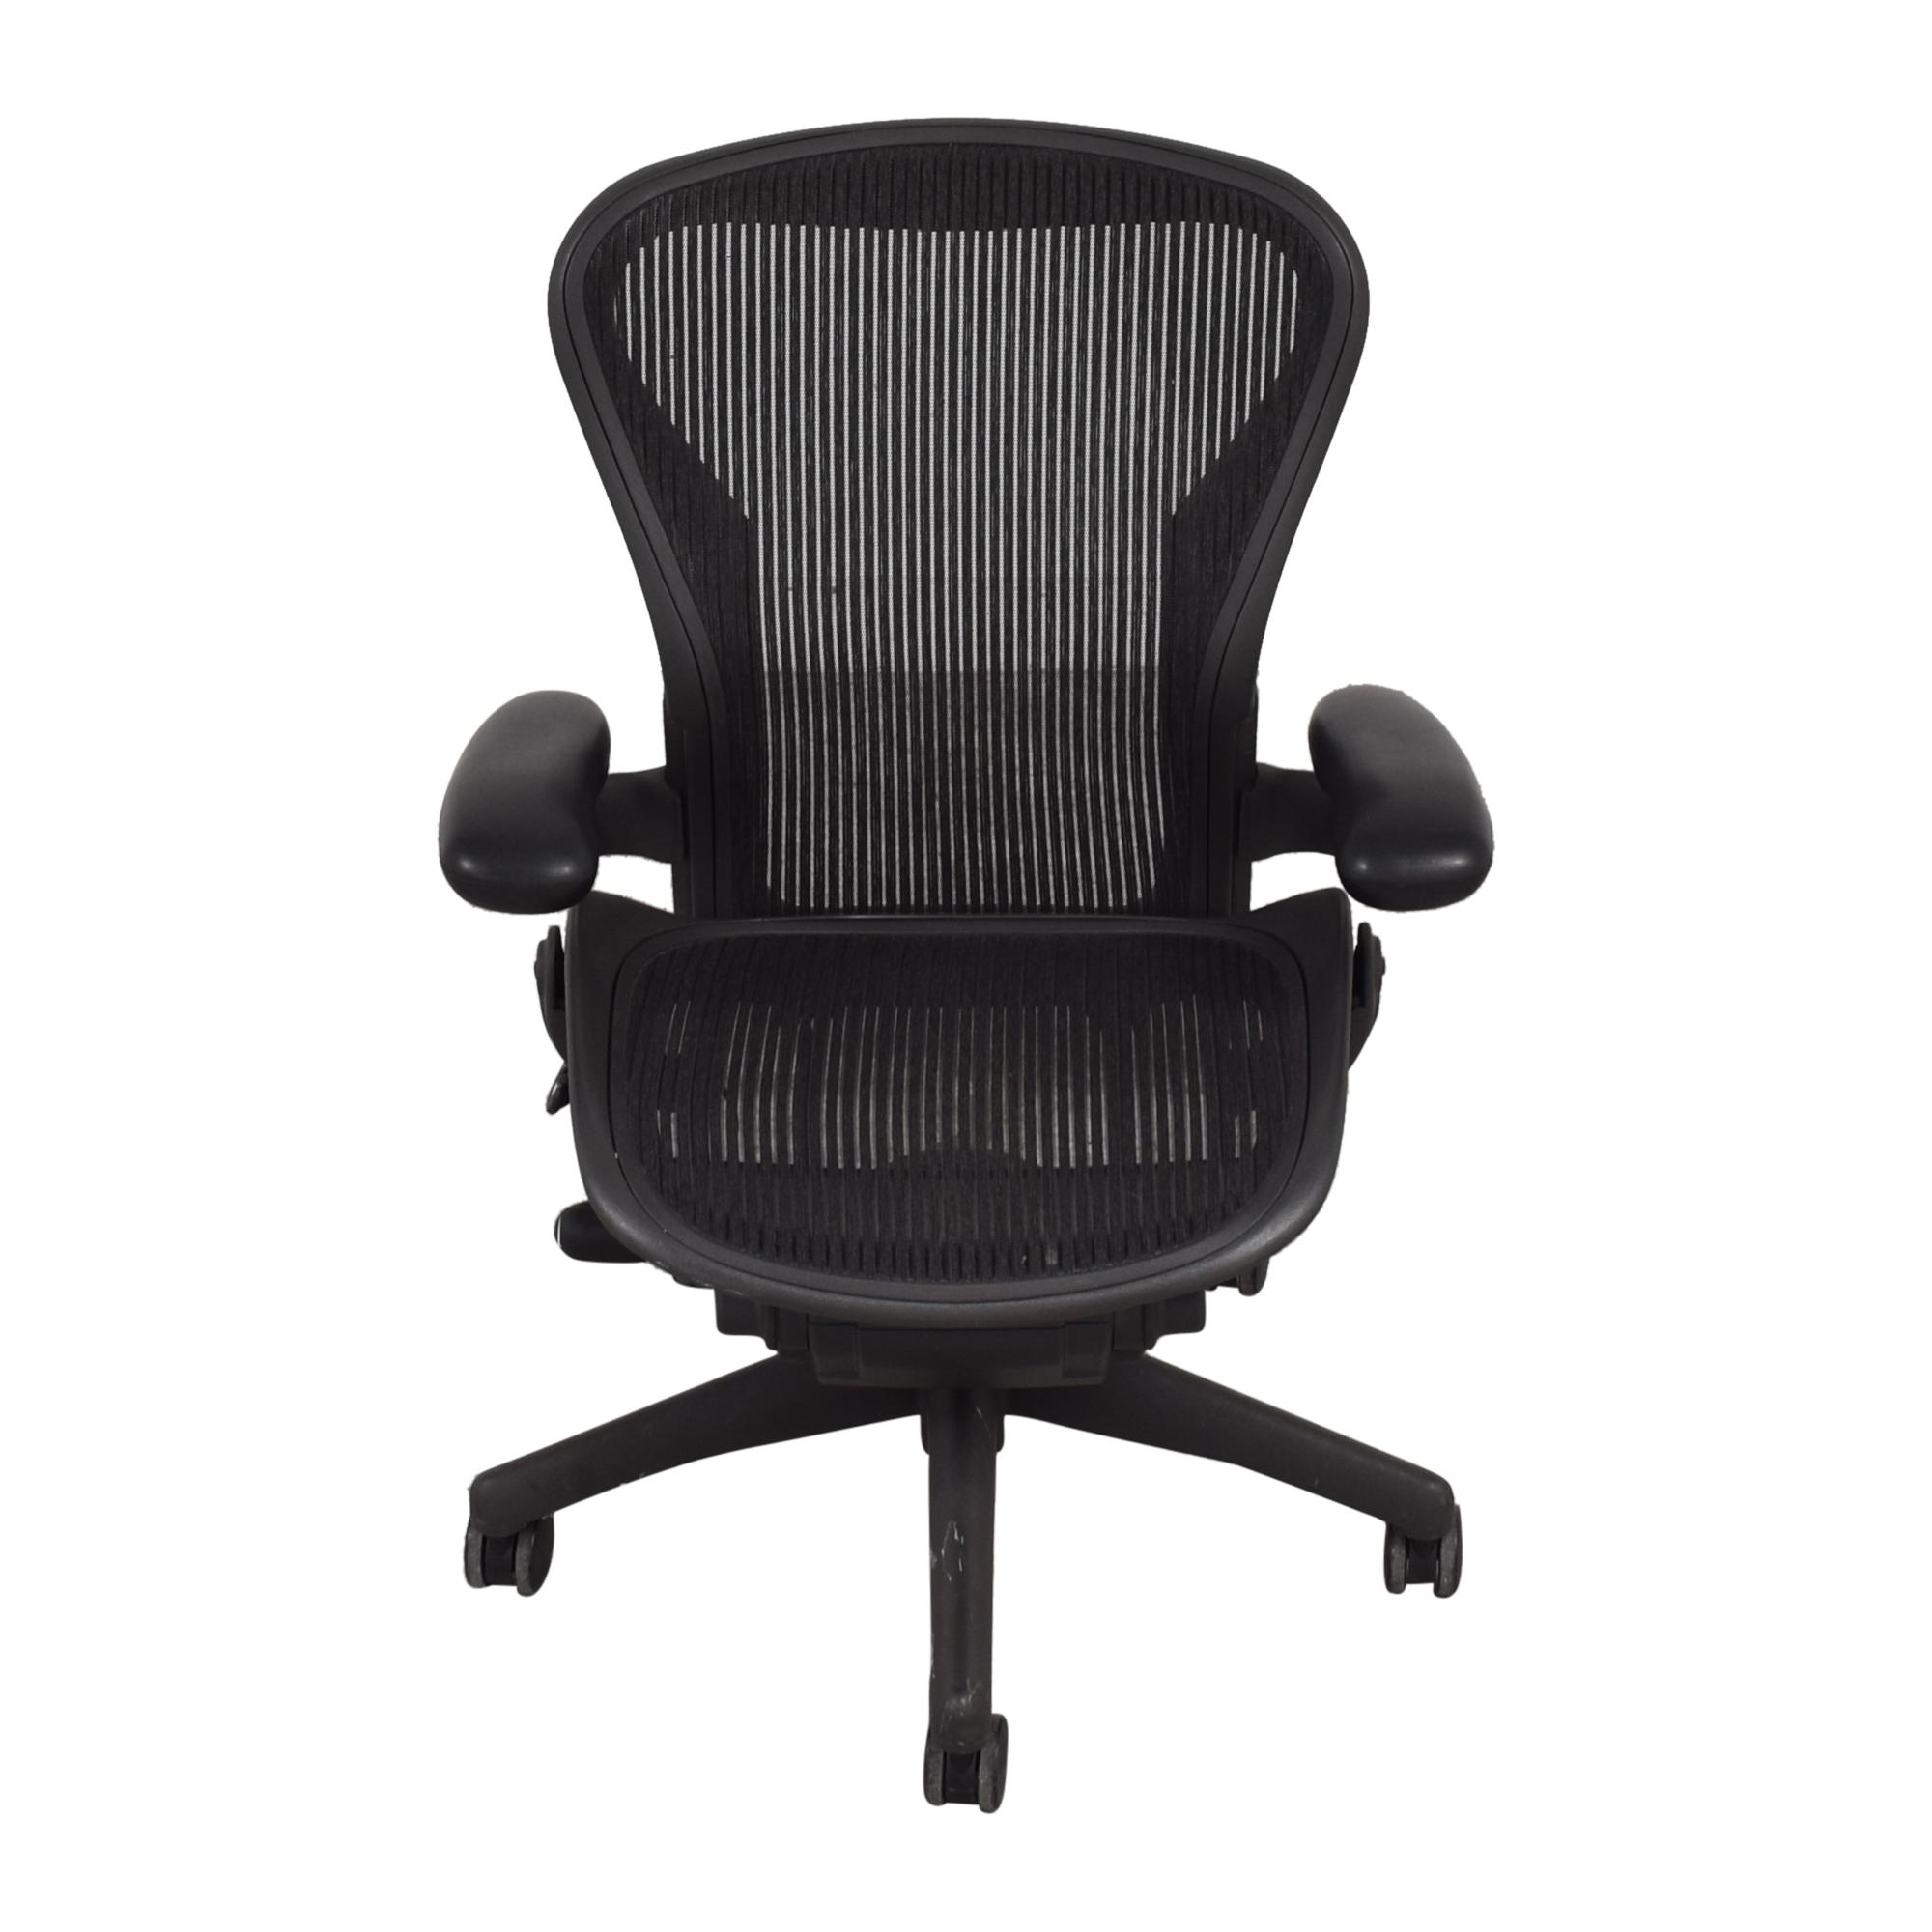 Herman Miller Herman Miller Size B Aeron Chair second hand